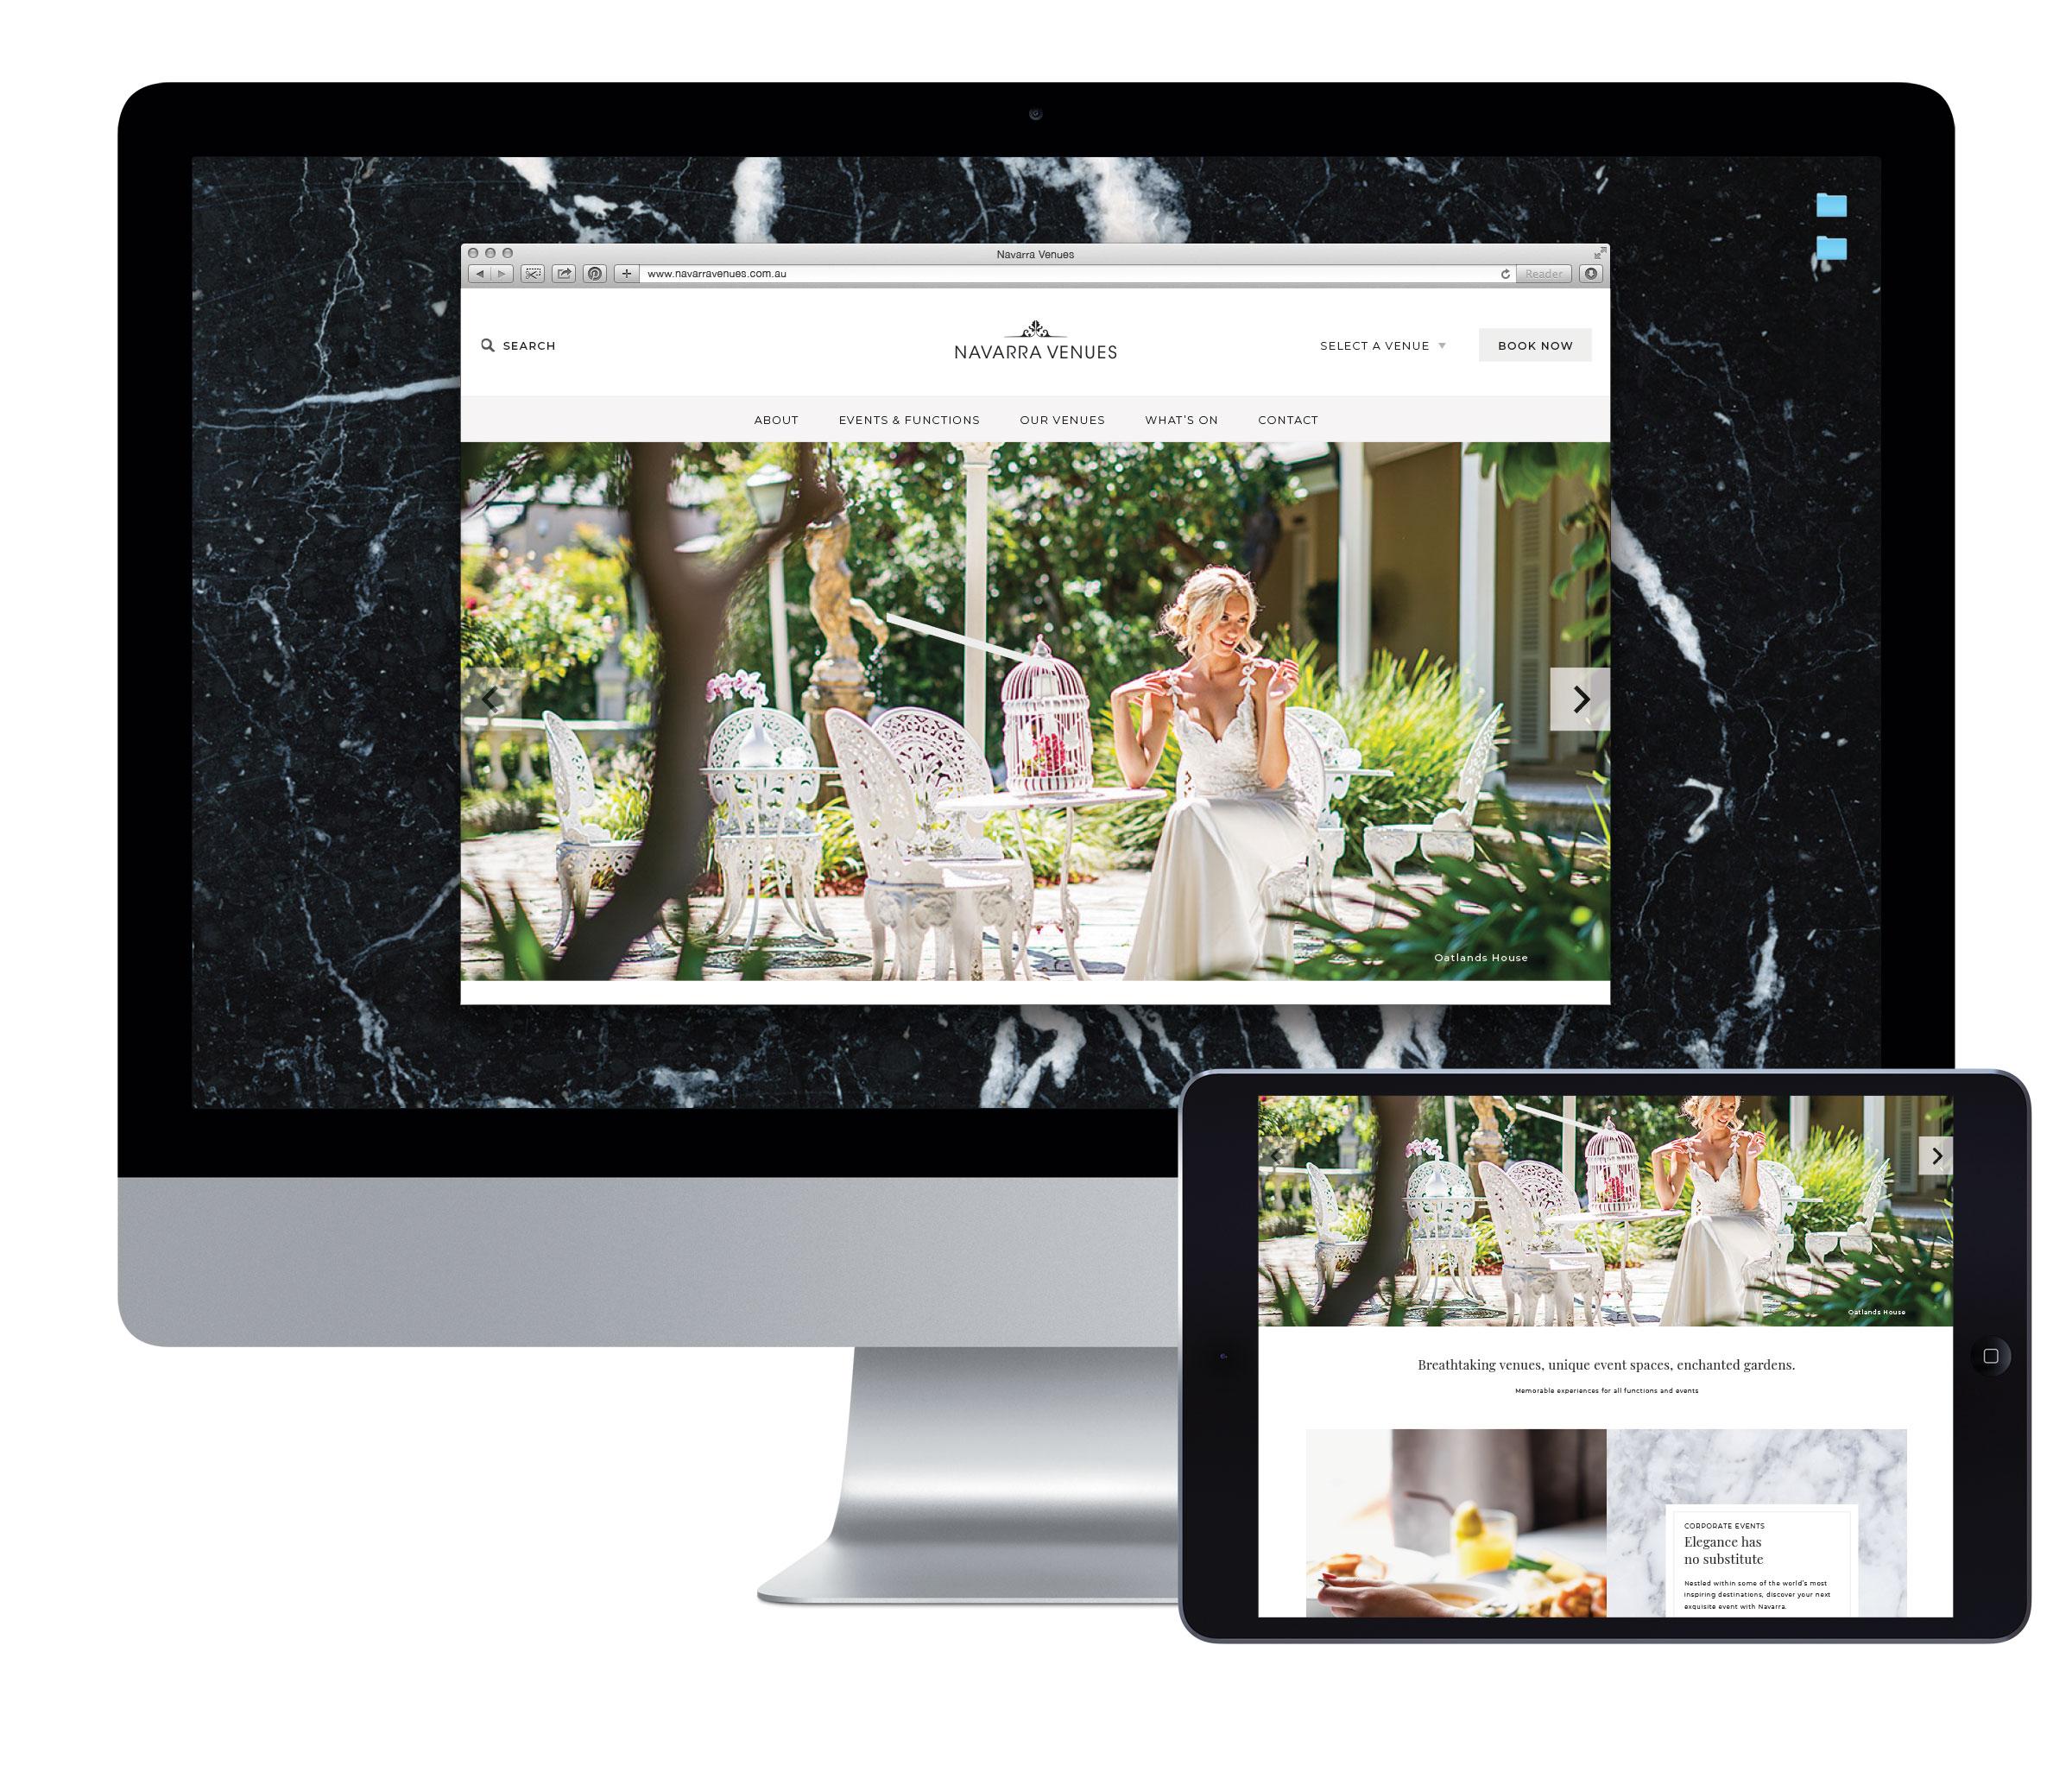 responsive-website-template-navarra.jpg